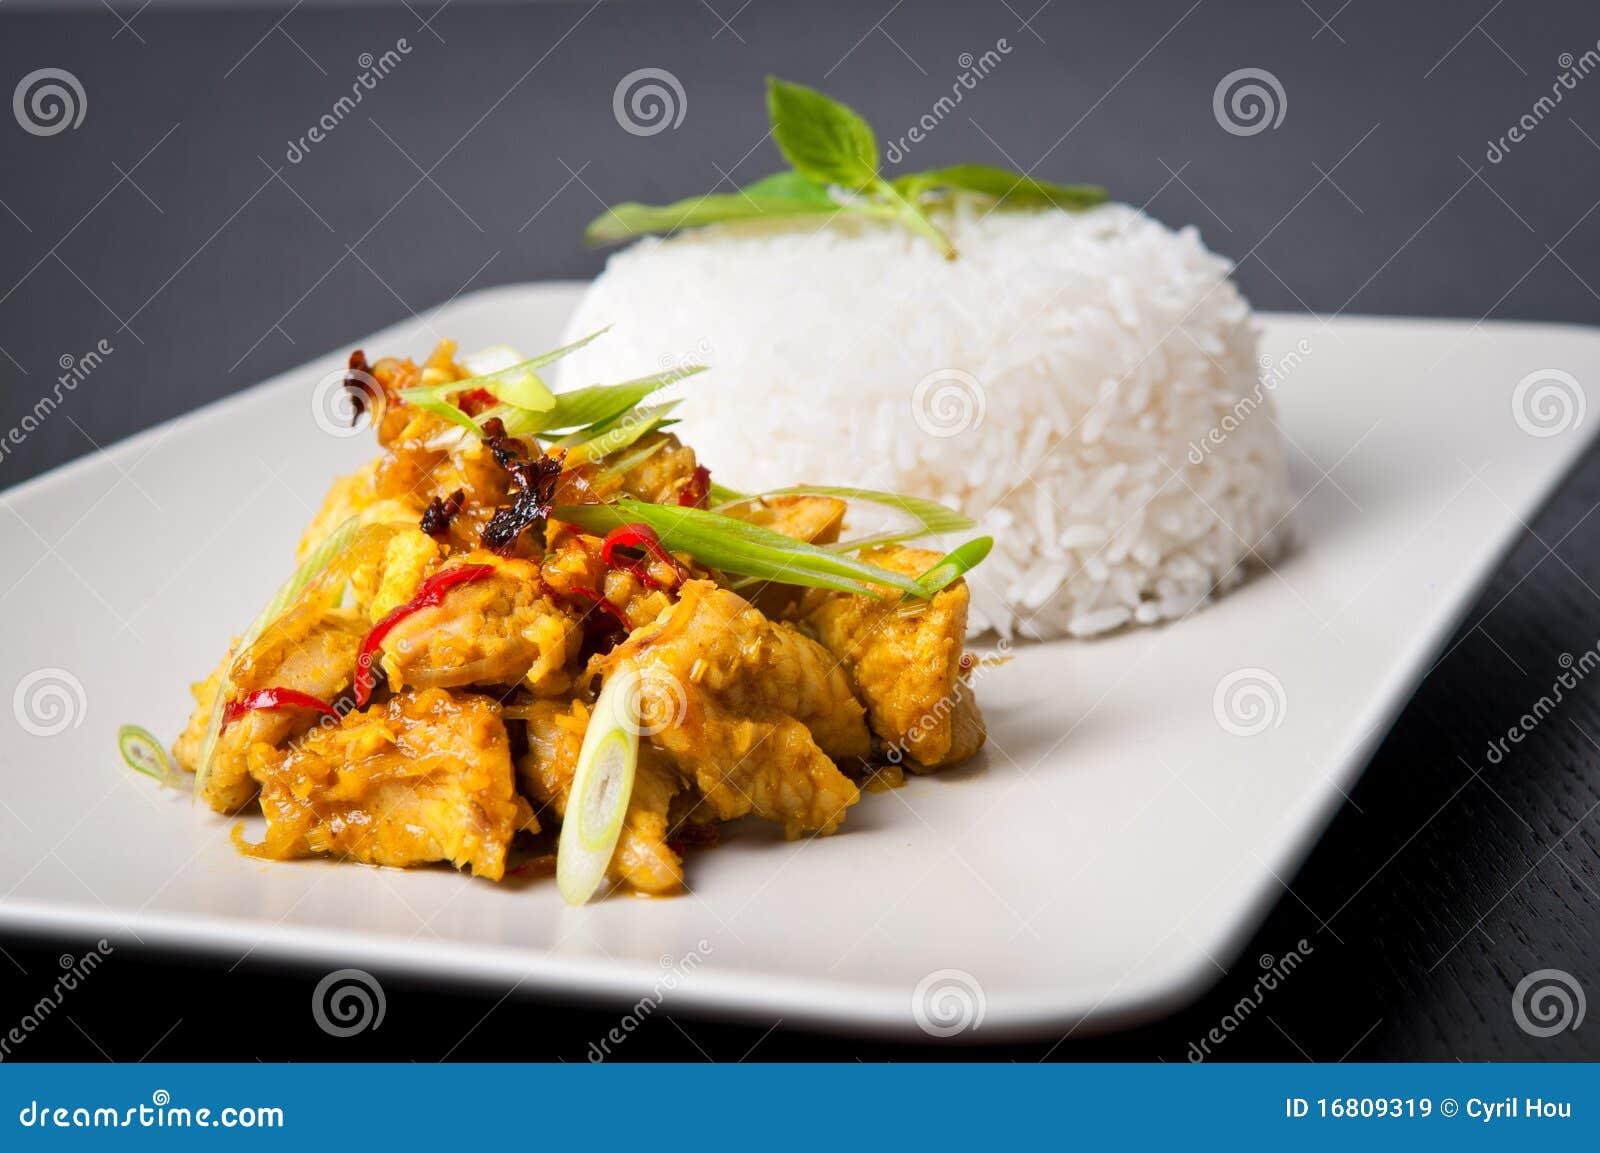 Lemongrass chicken dish